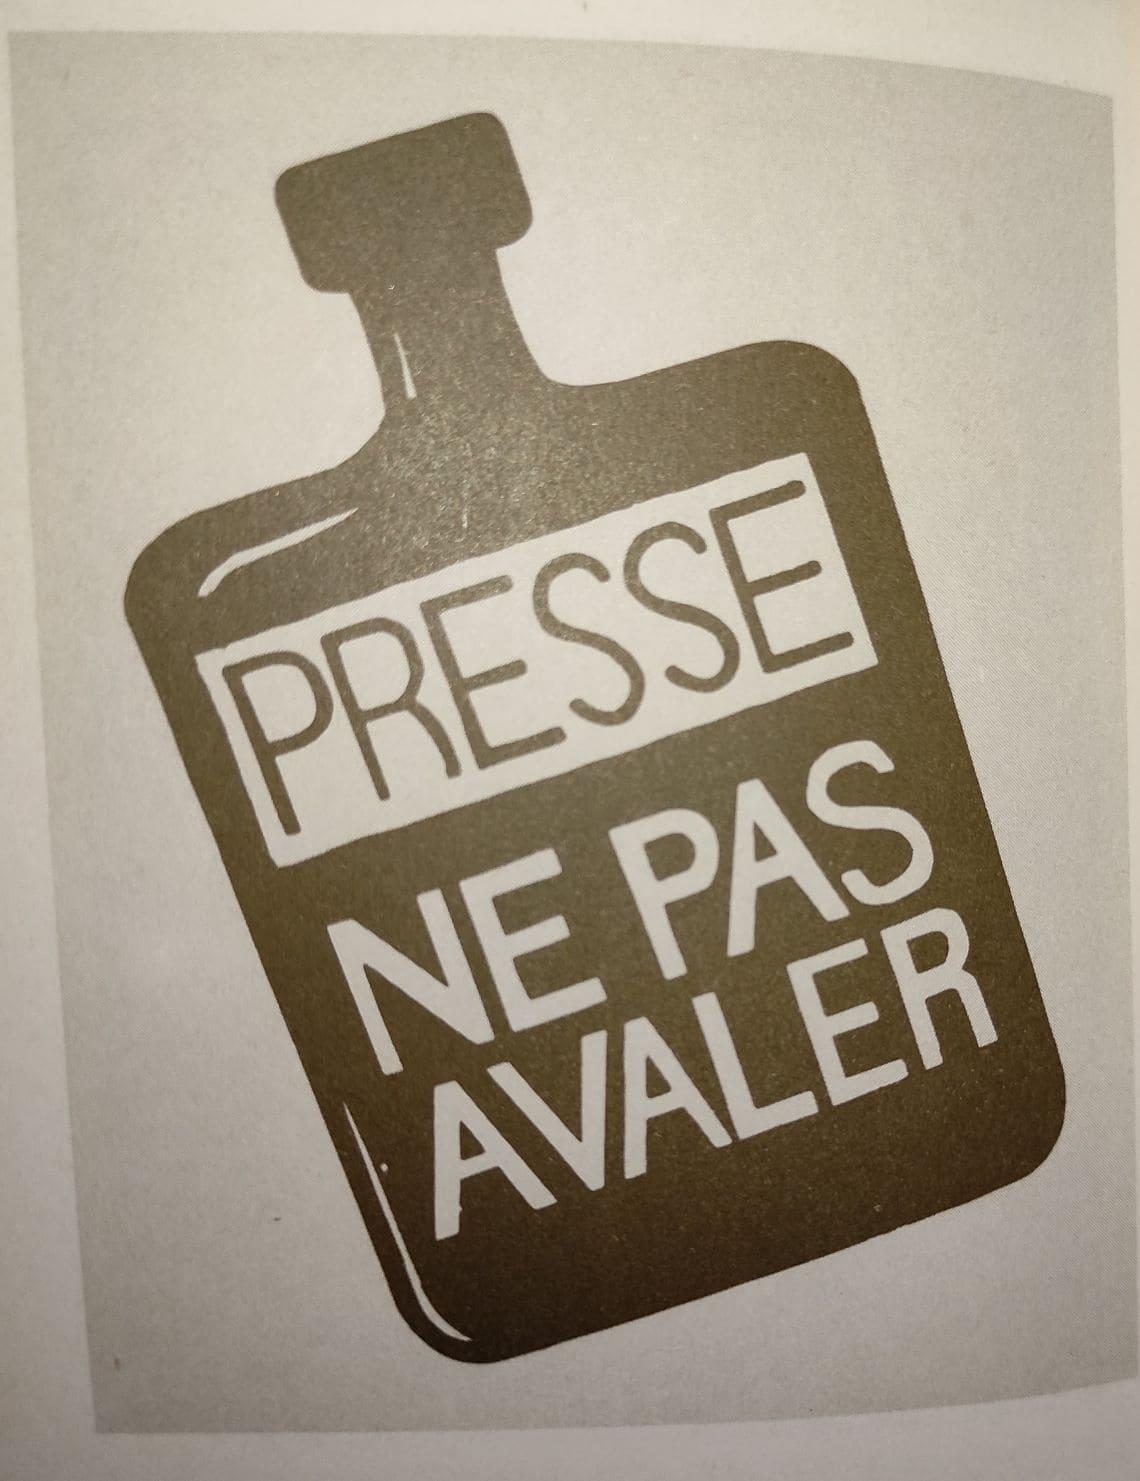 Presse : ne pas avaler